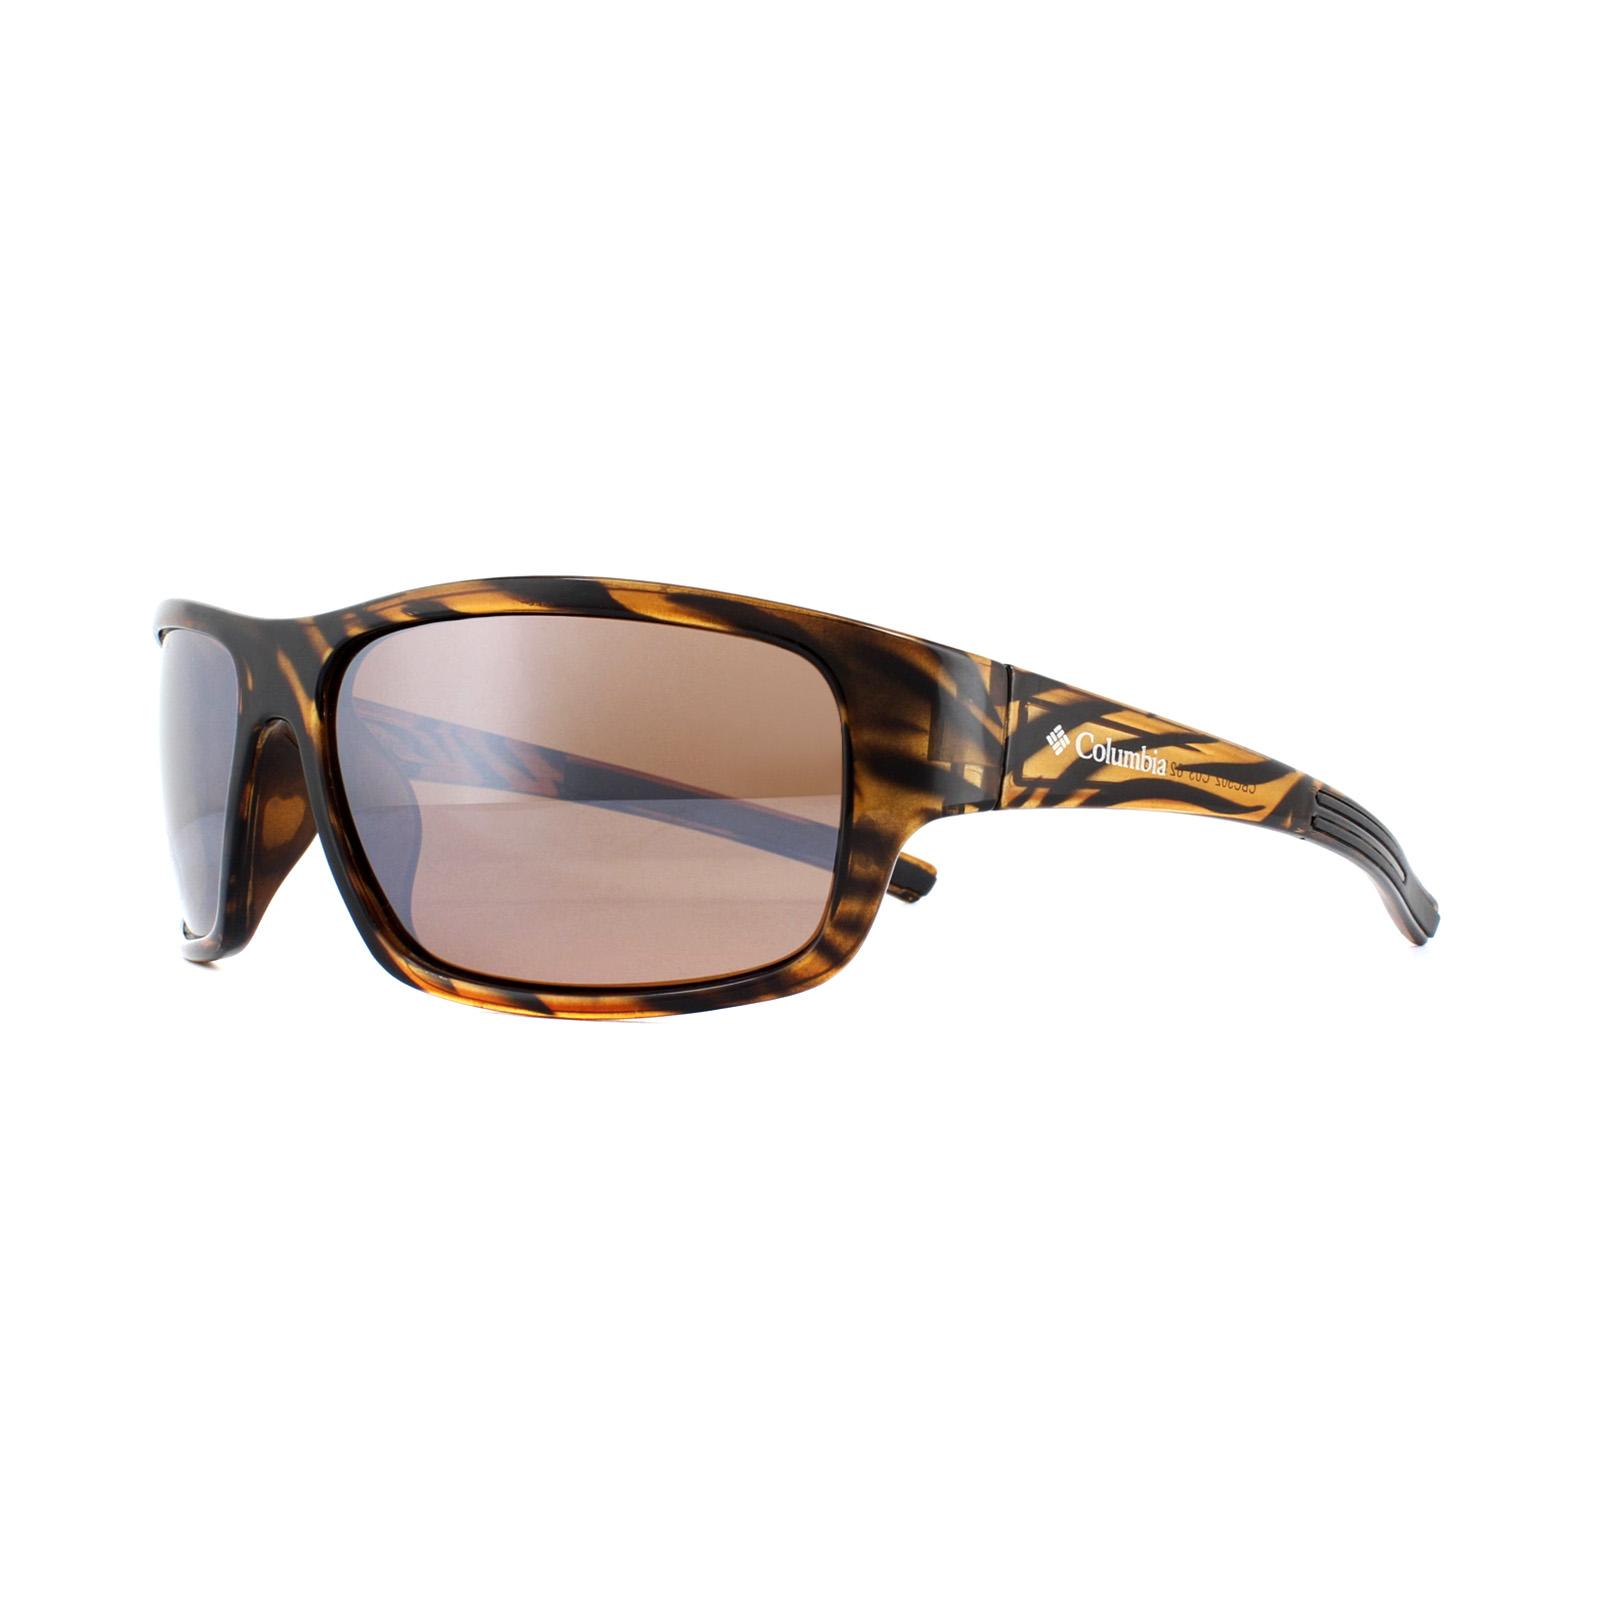 0da67c6727 Sentinel Columbia Sunglasses 502 03 Stripe Tortoise Brown Polarized